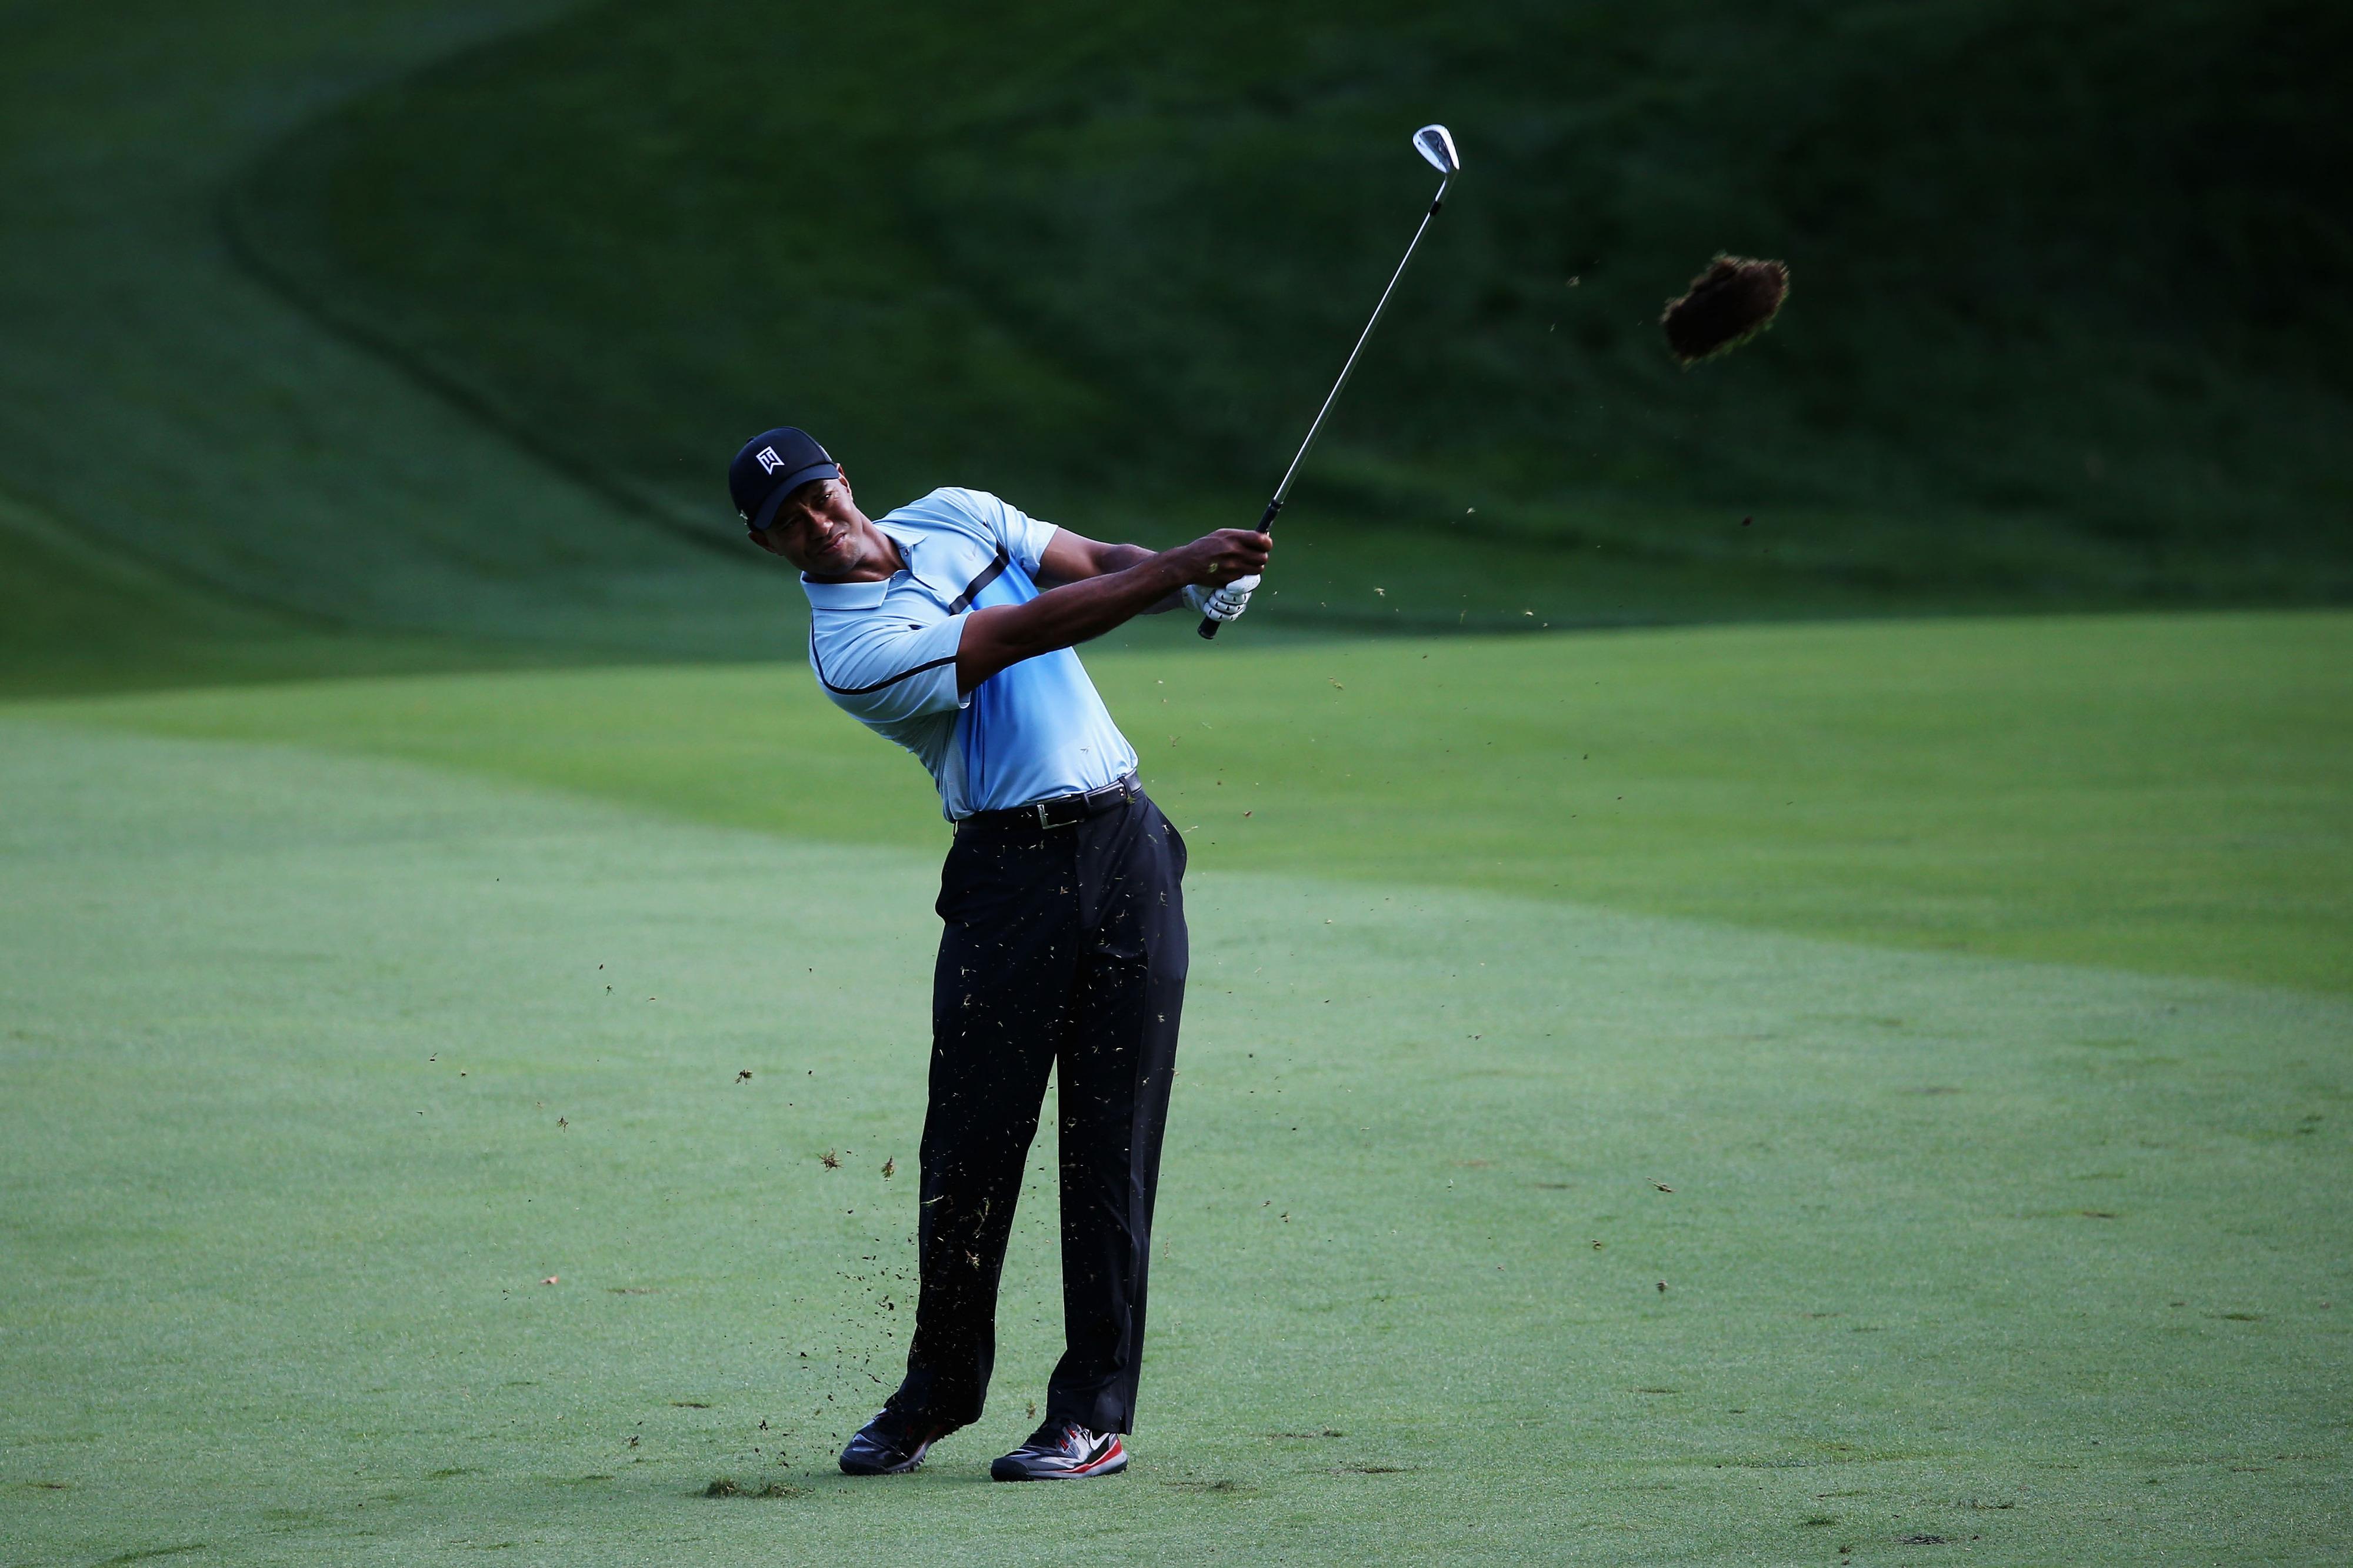 2013 PGA Championship leaderboard: Tiger Woods makes turn 2 shots back